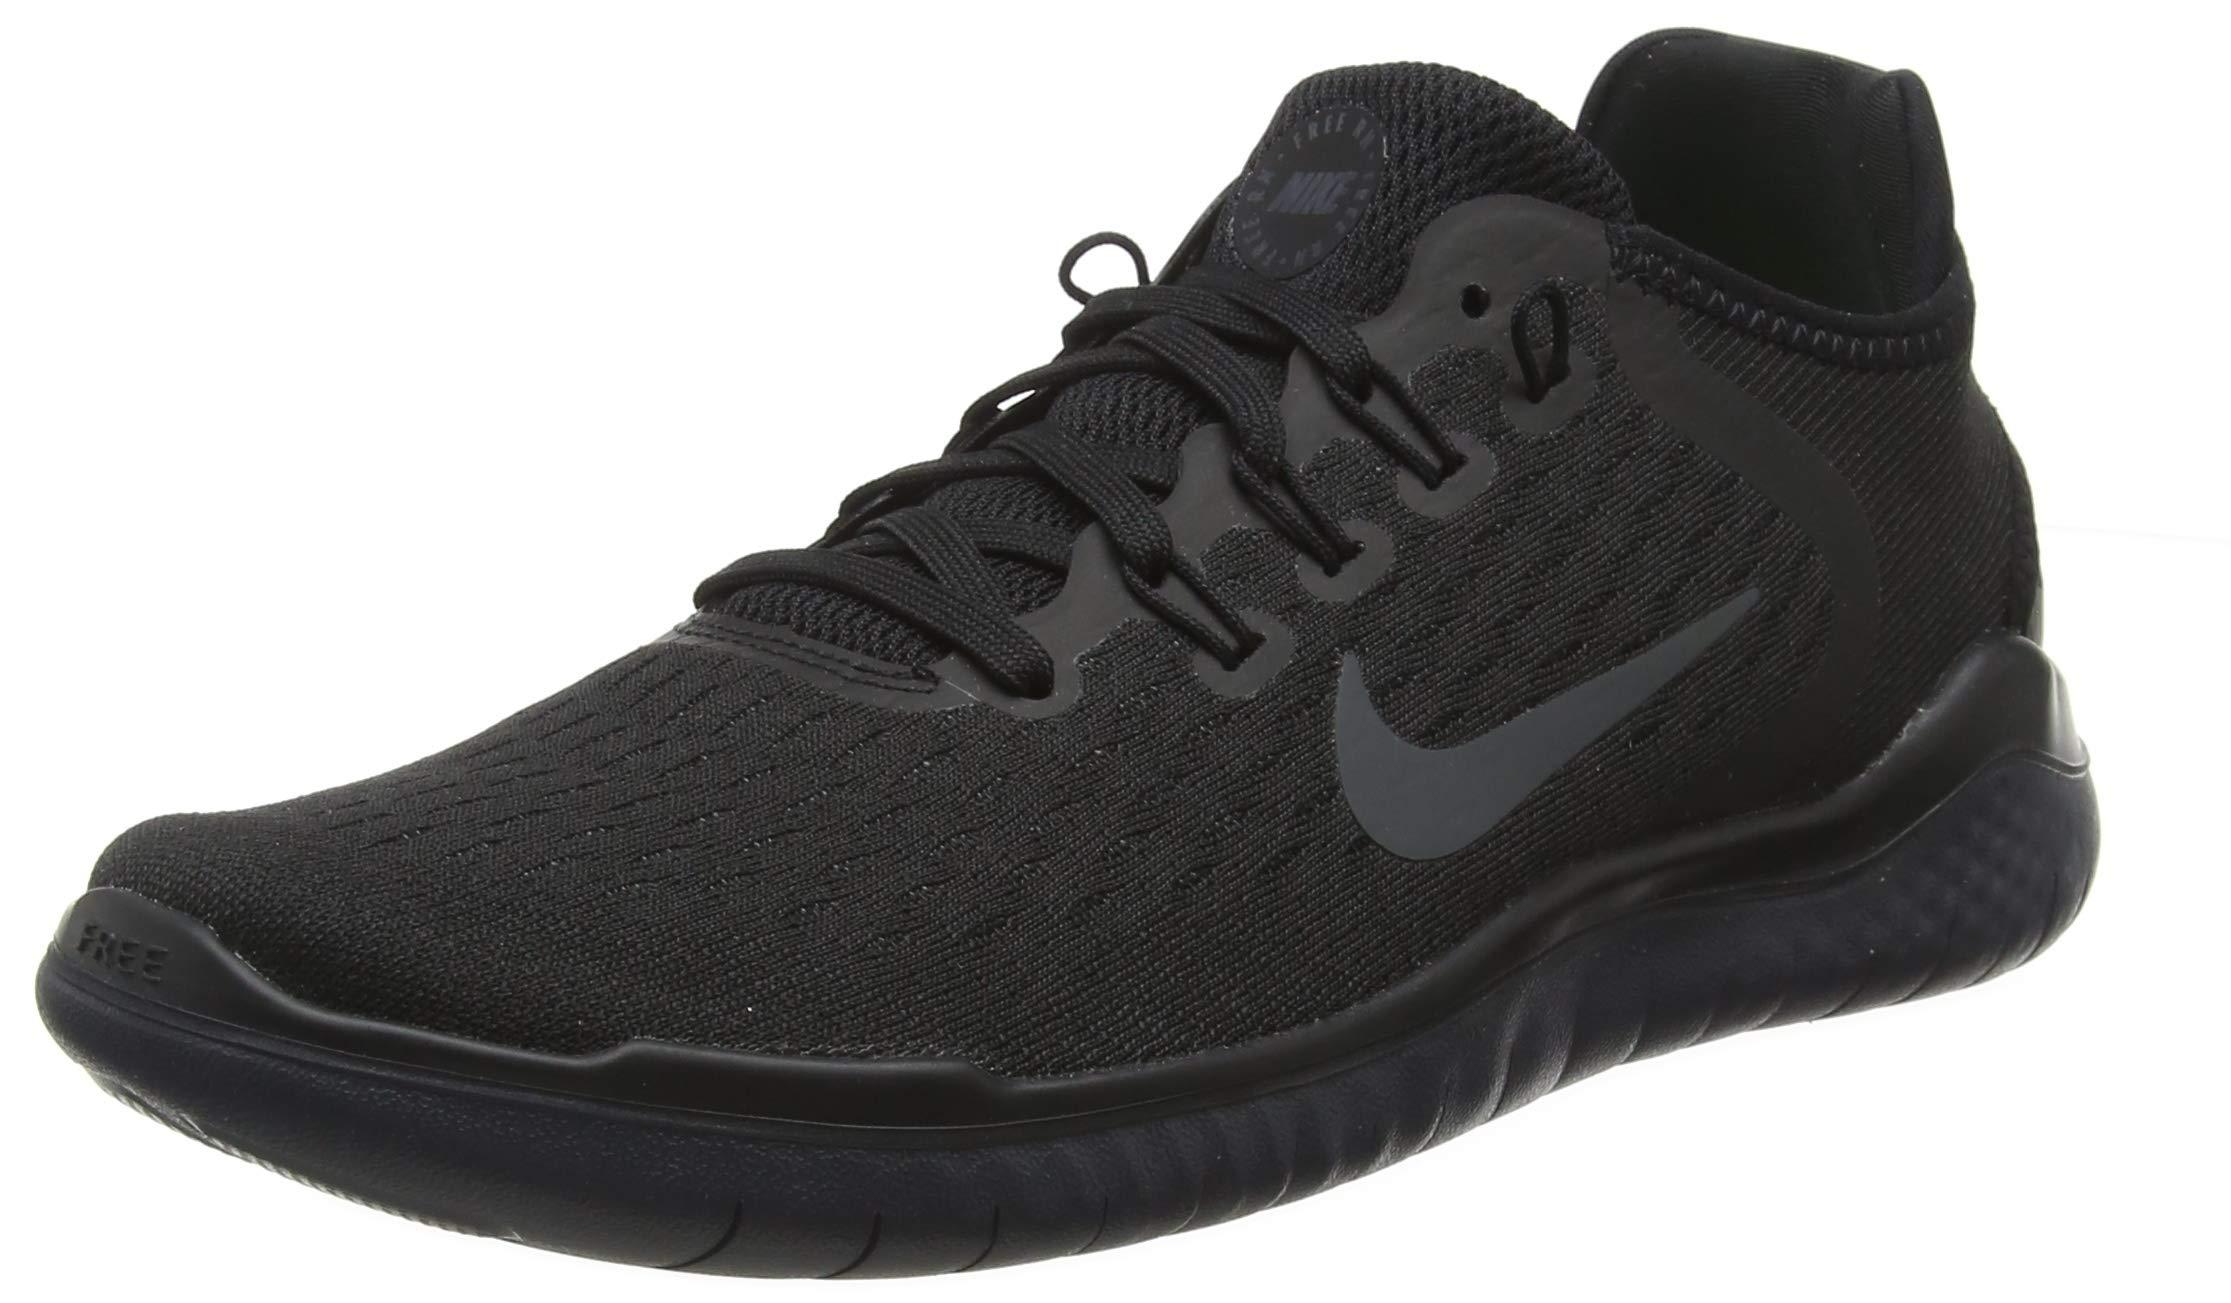 Nike Free Rn 2018 Mens 942836-002 Size 6.5 Black/Anthracite